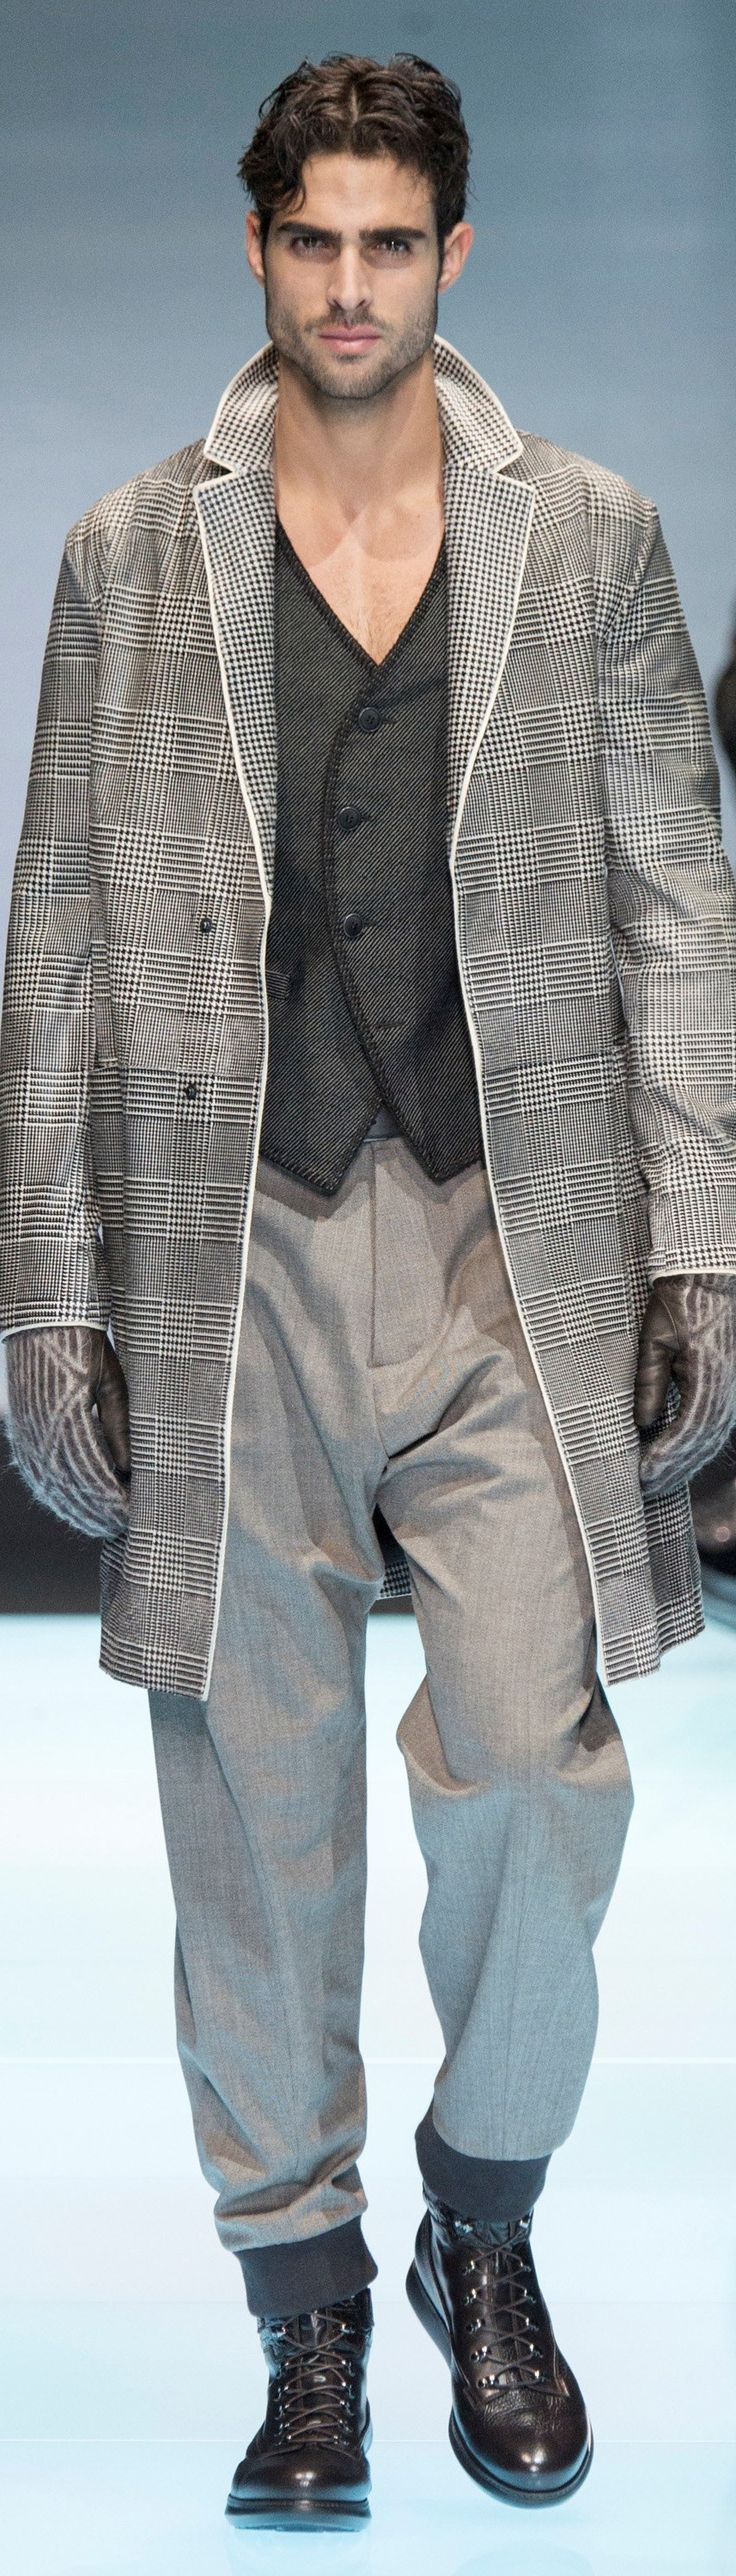 Giorgio Armani - Menswear Fall 2016